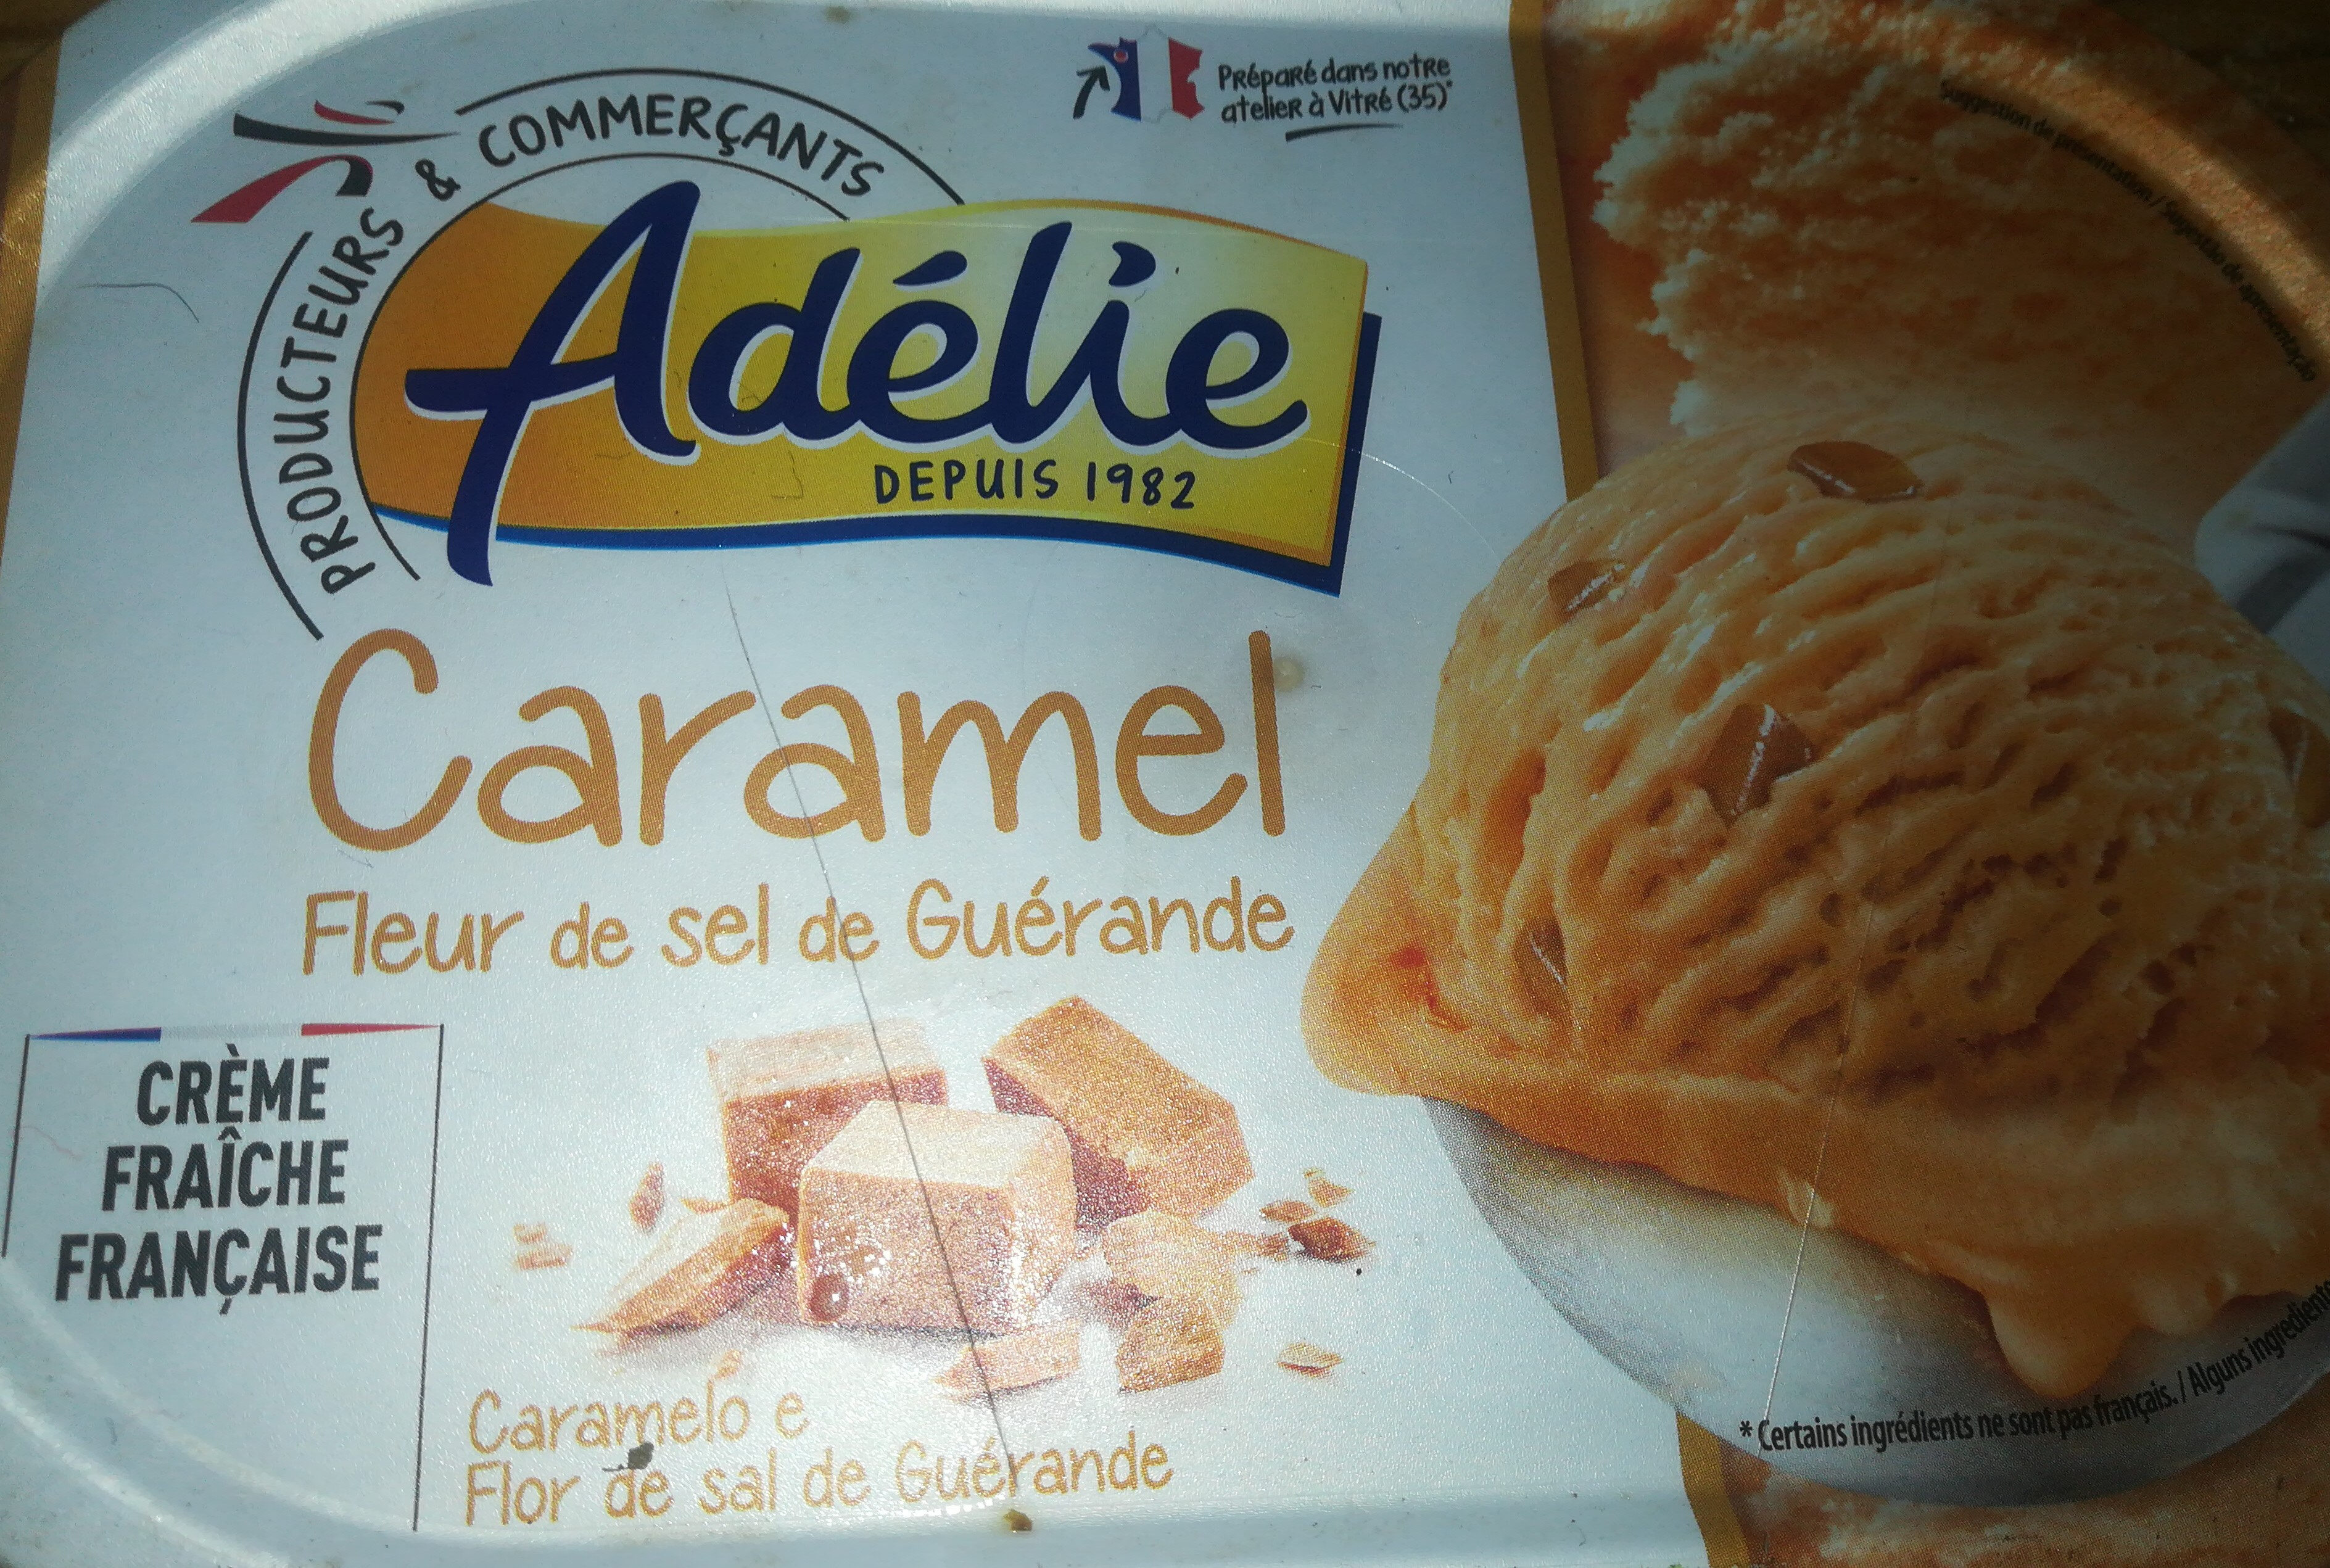 Bac caramel fleur de sel de Guérande (CG) - Product